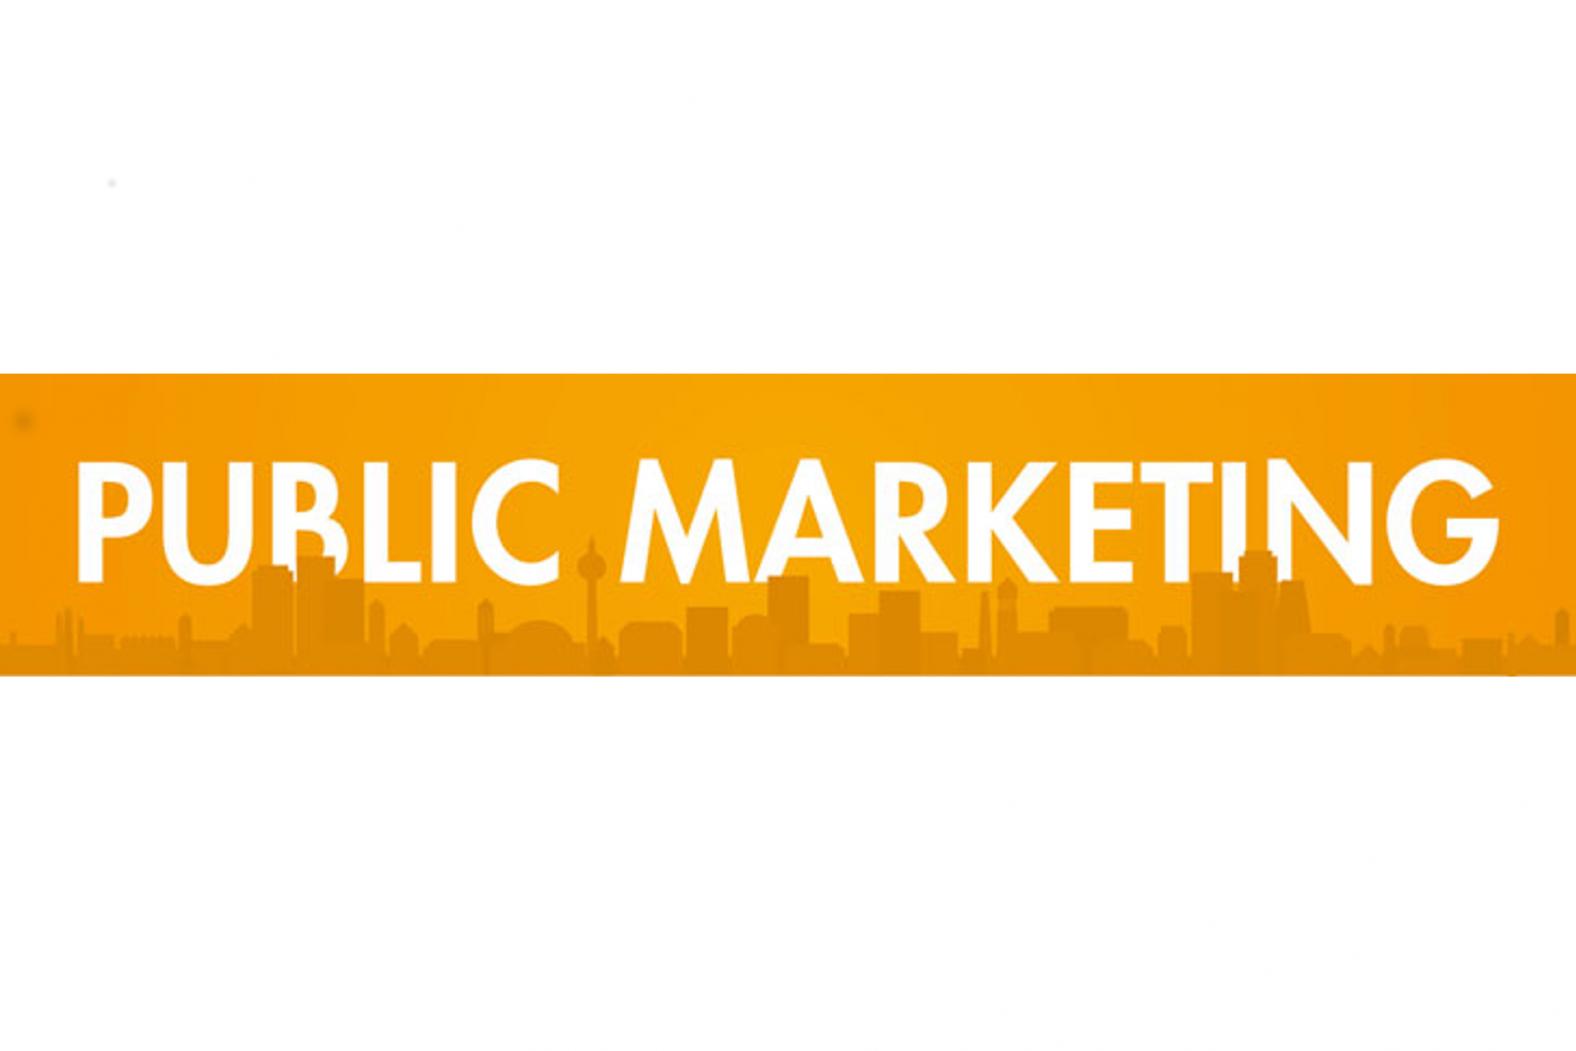 Logo der Public Marketing